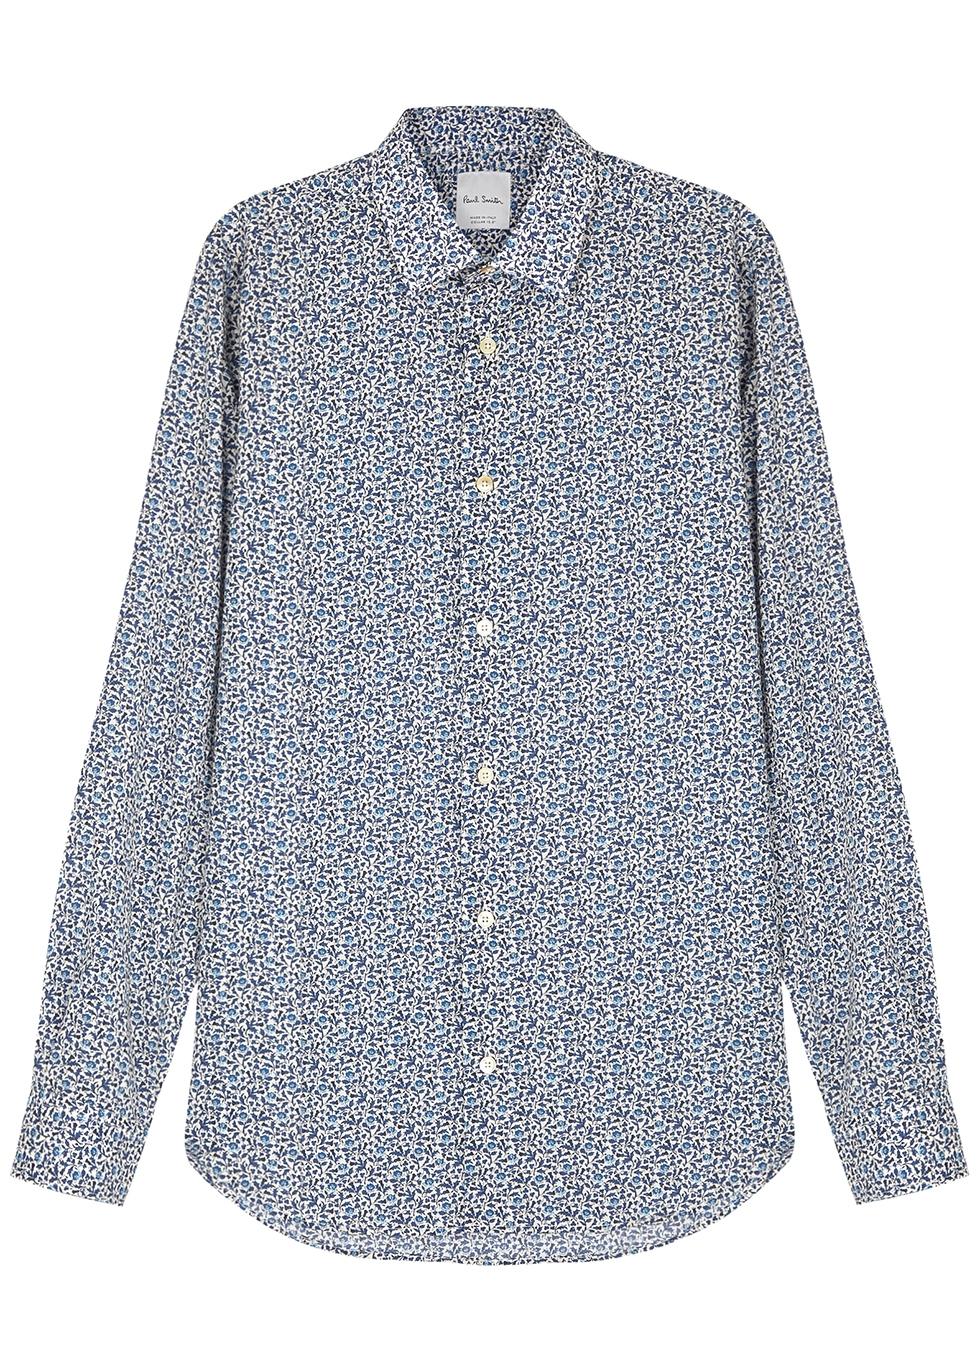 13056f0d6717 Paul Smith T-Shirts, Jeans, Jumpers, Jackets - Harvey Nichols